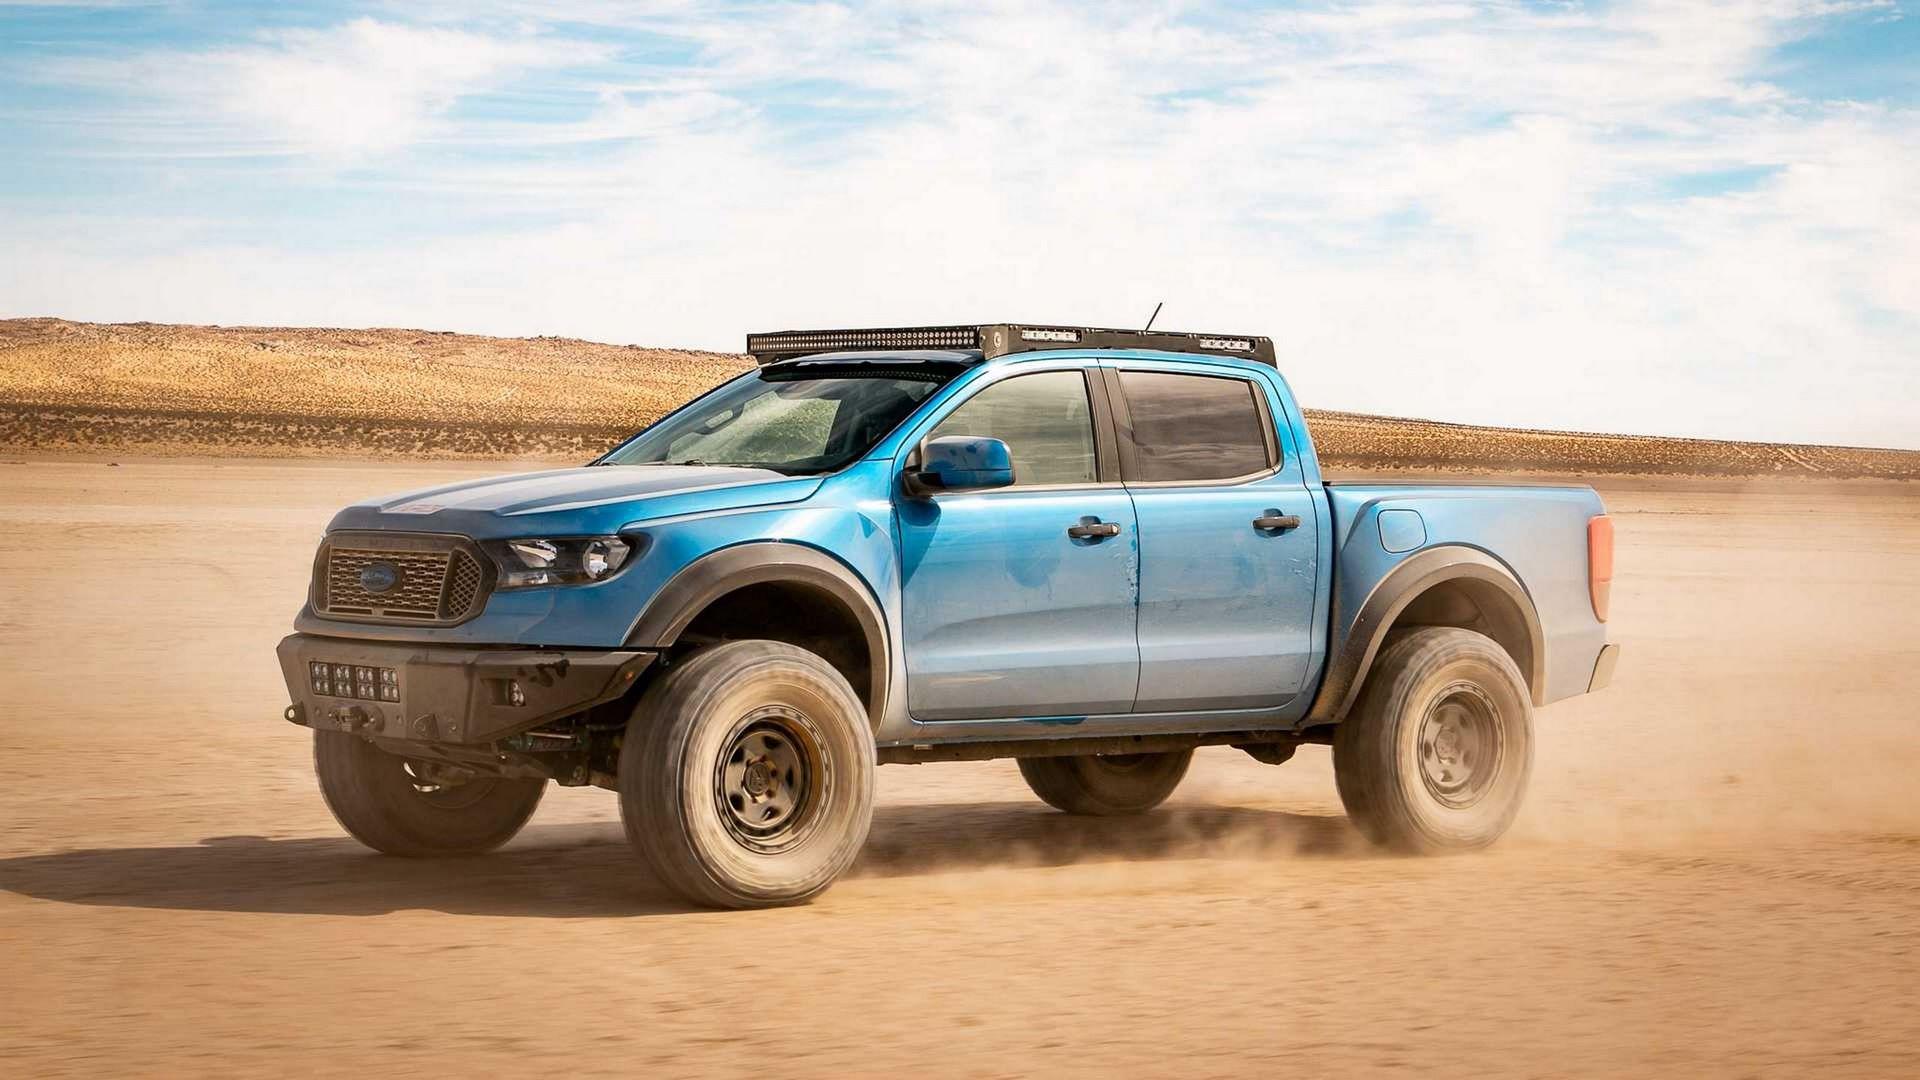 Ford-Ranger-Prorunner-By-APG-6